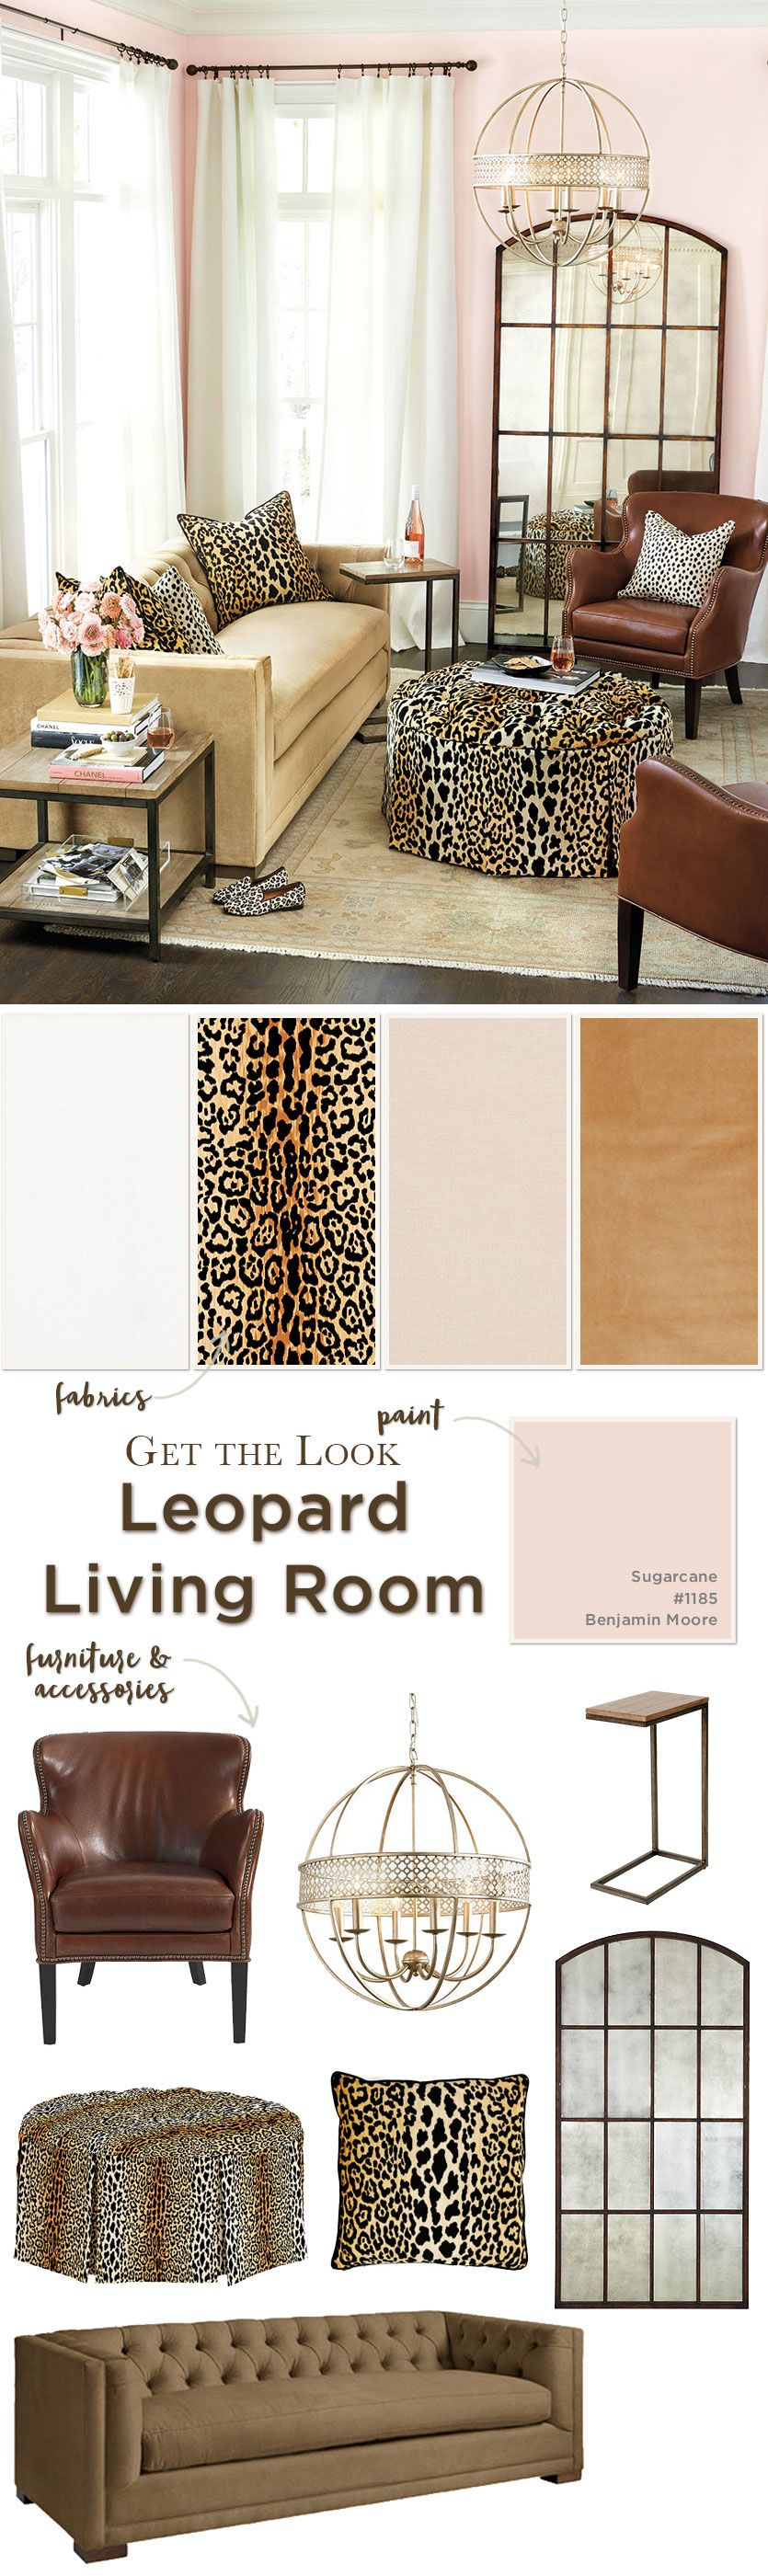 Get the look: leopard living room   Living Room Ideas ...